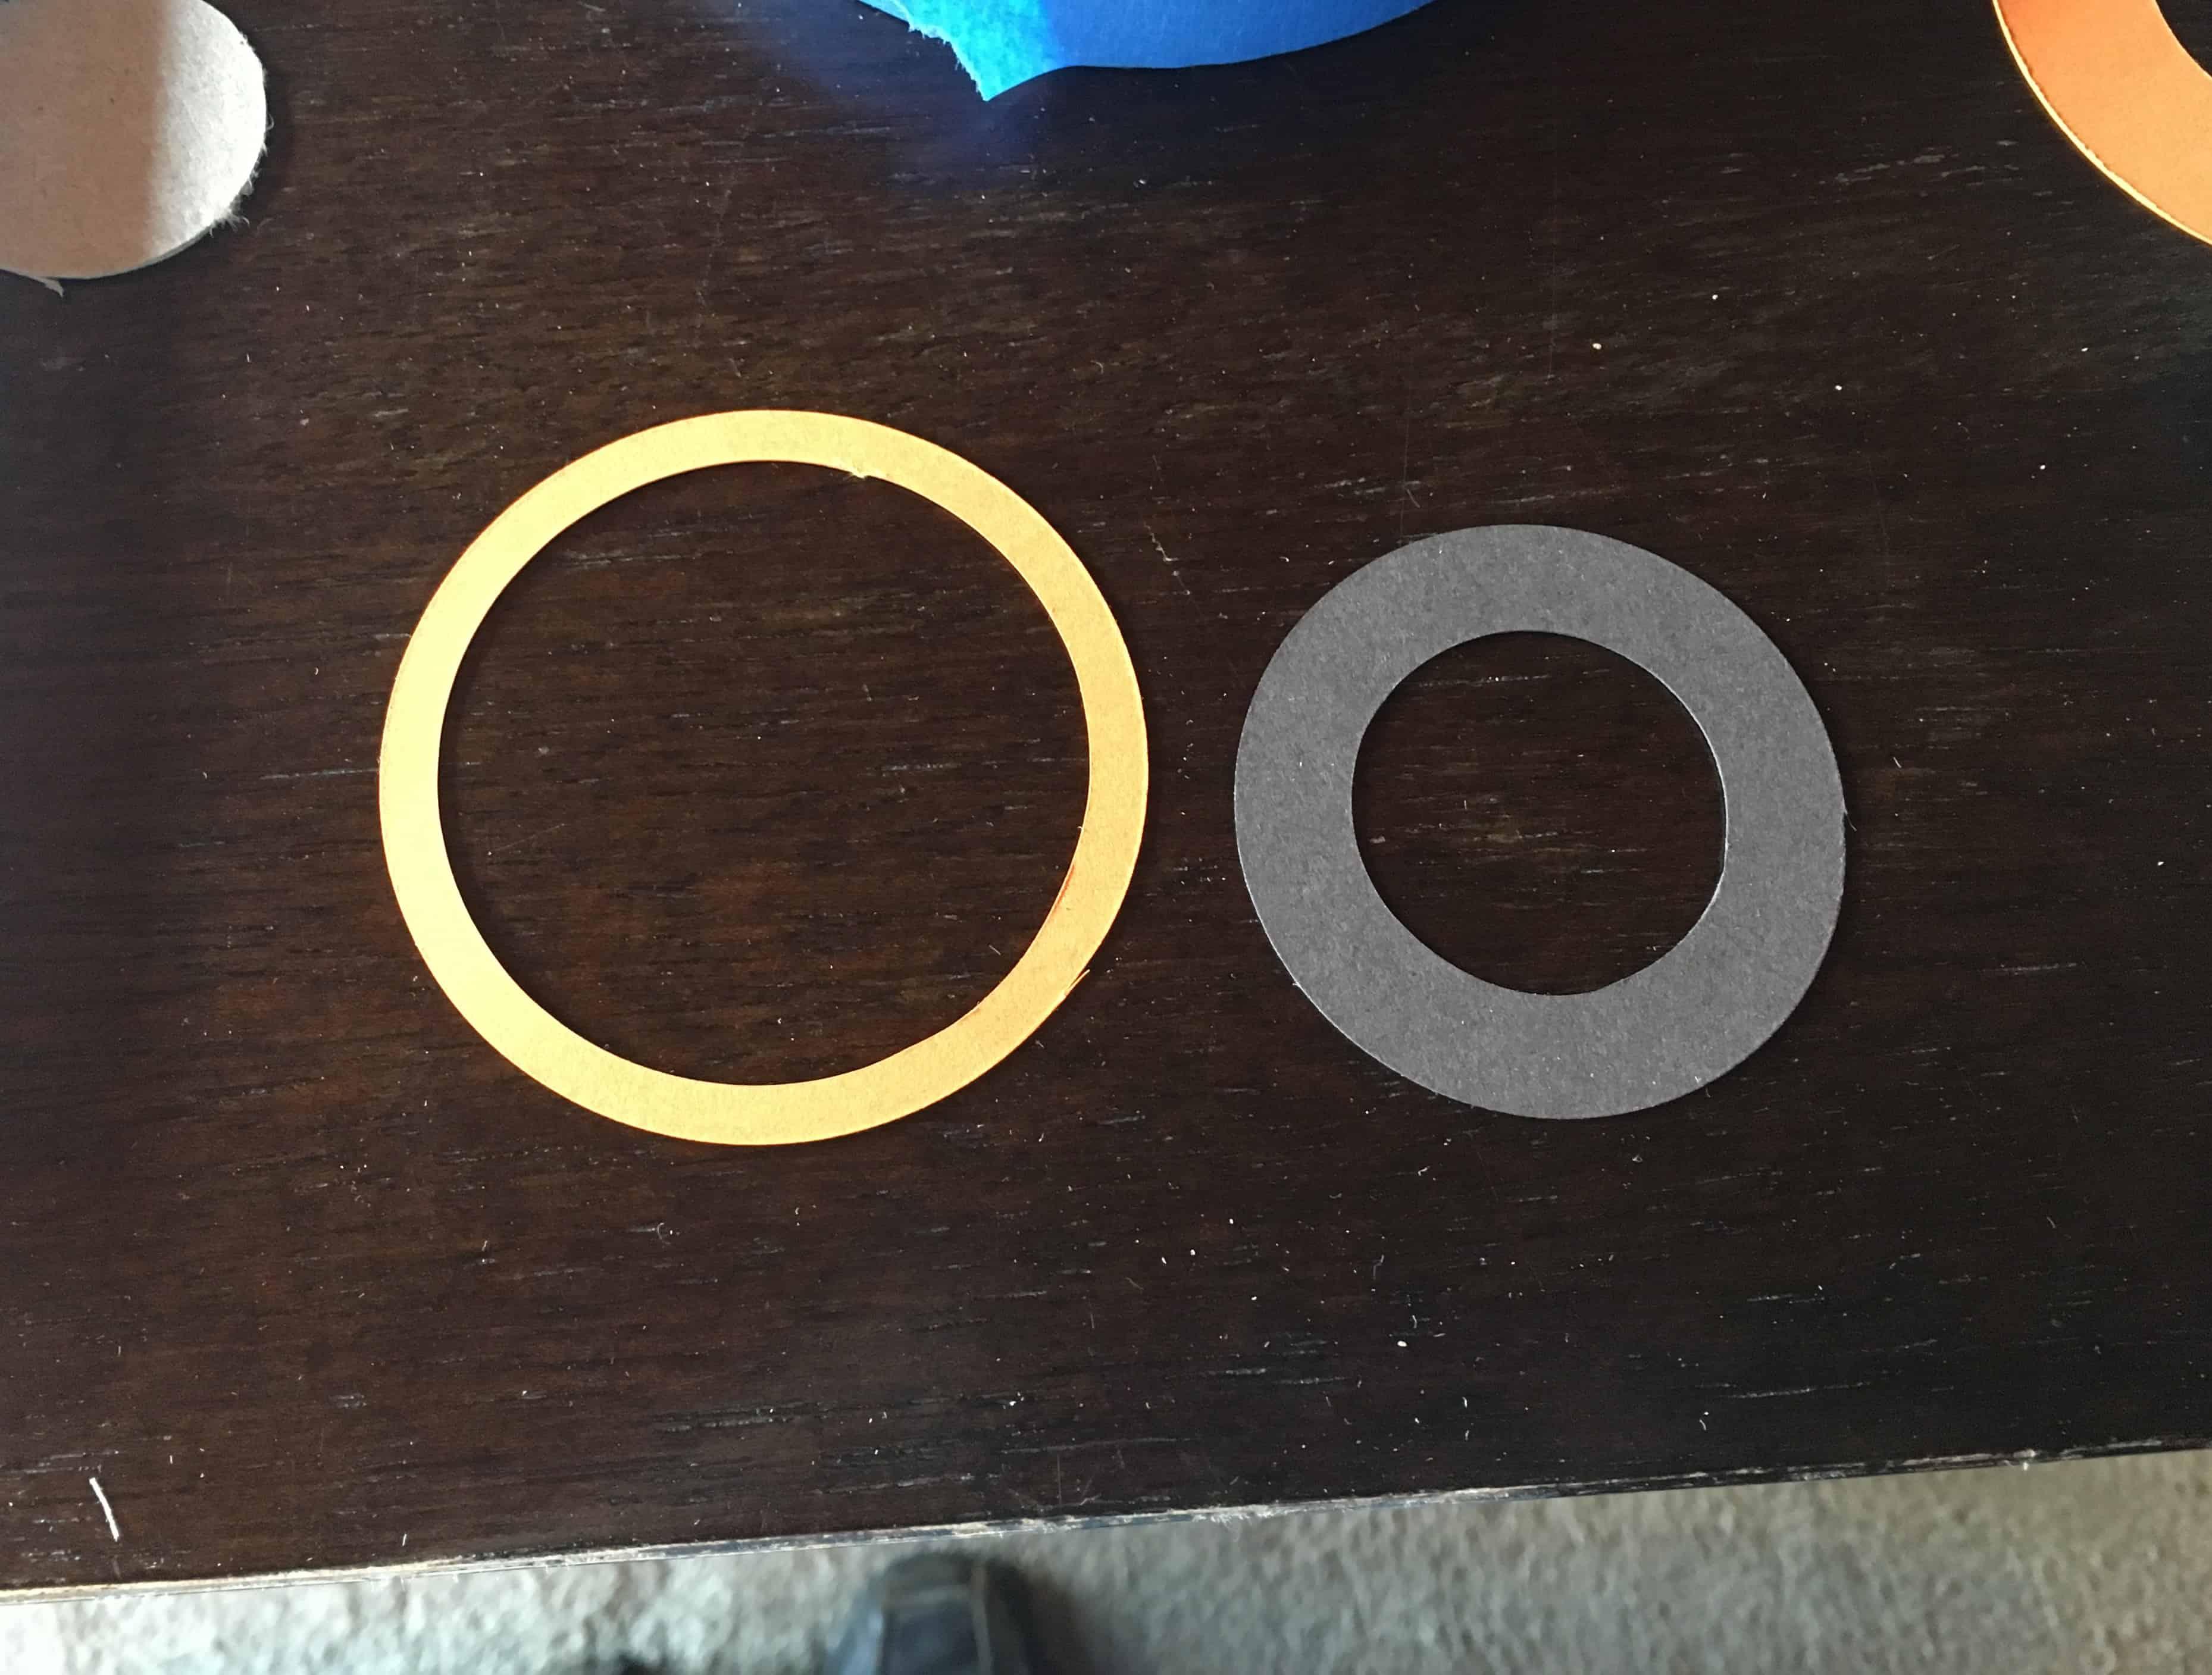 Saturn Rings 1